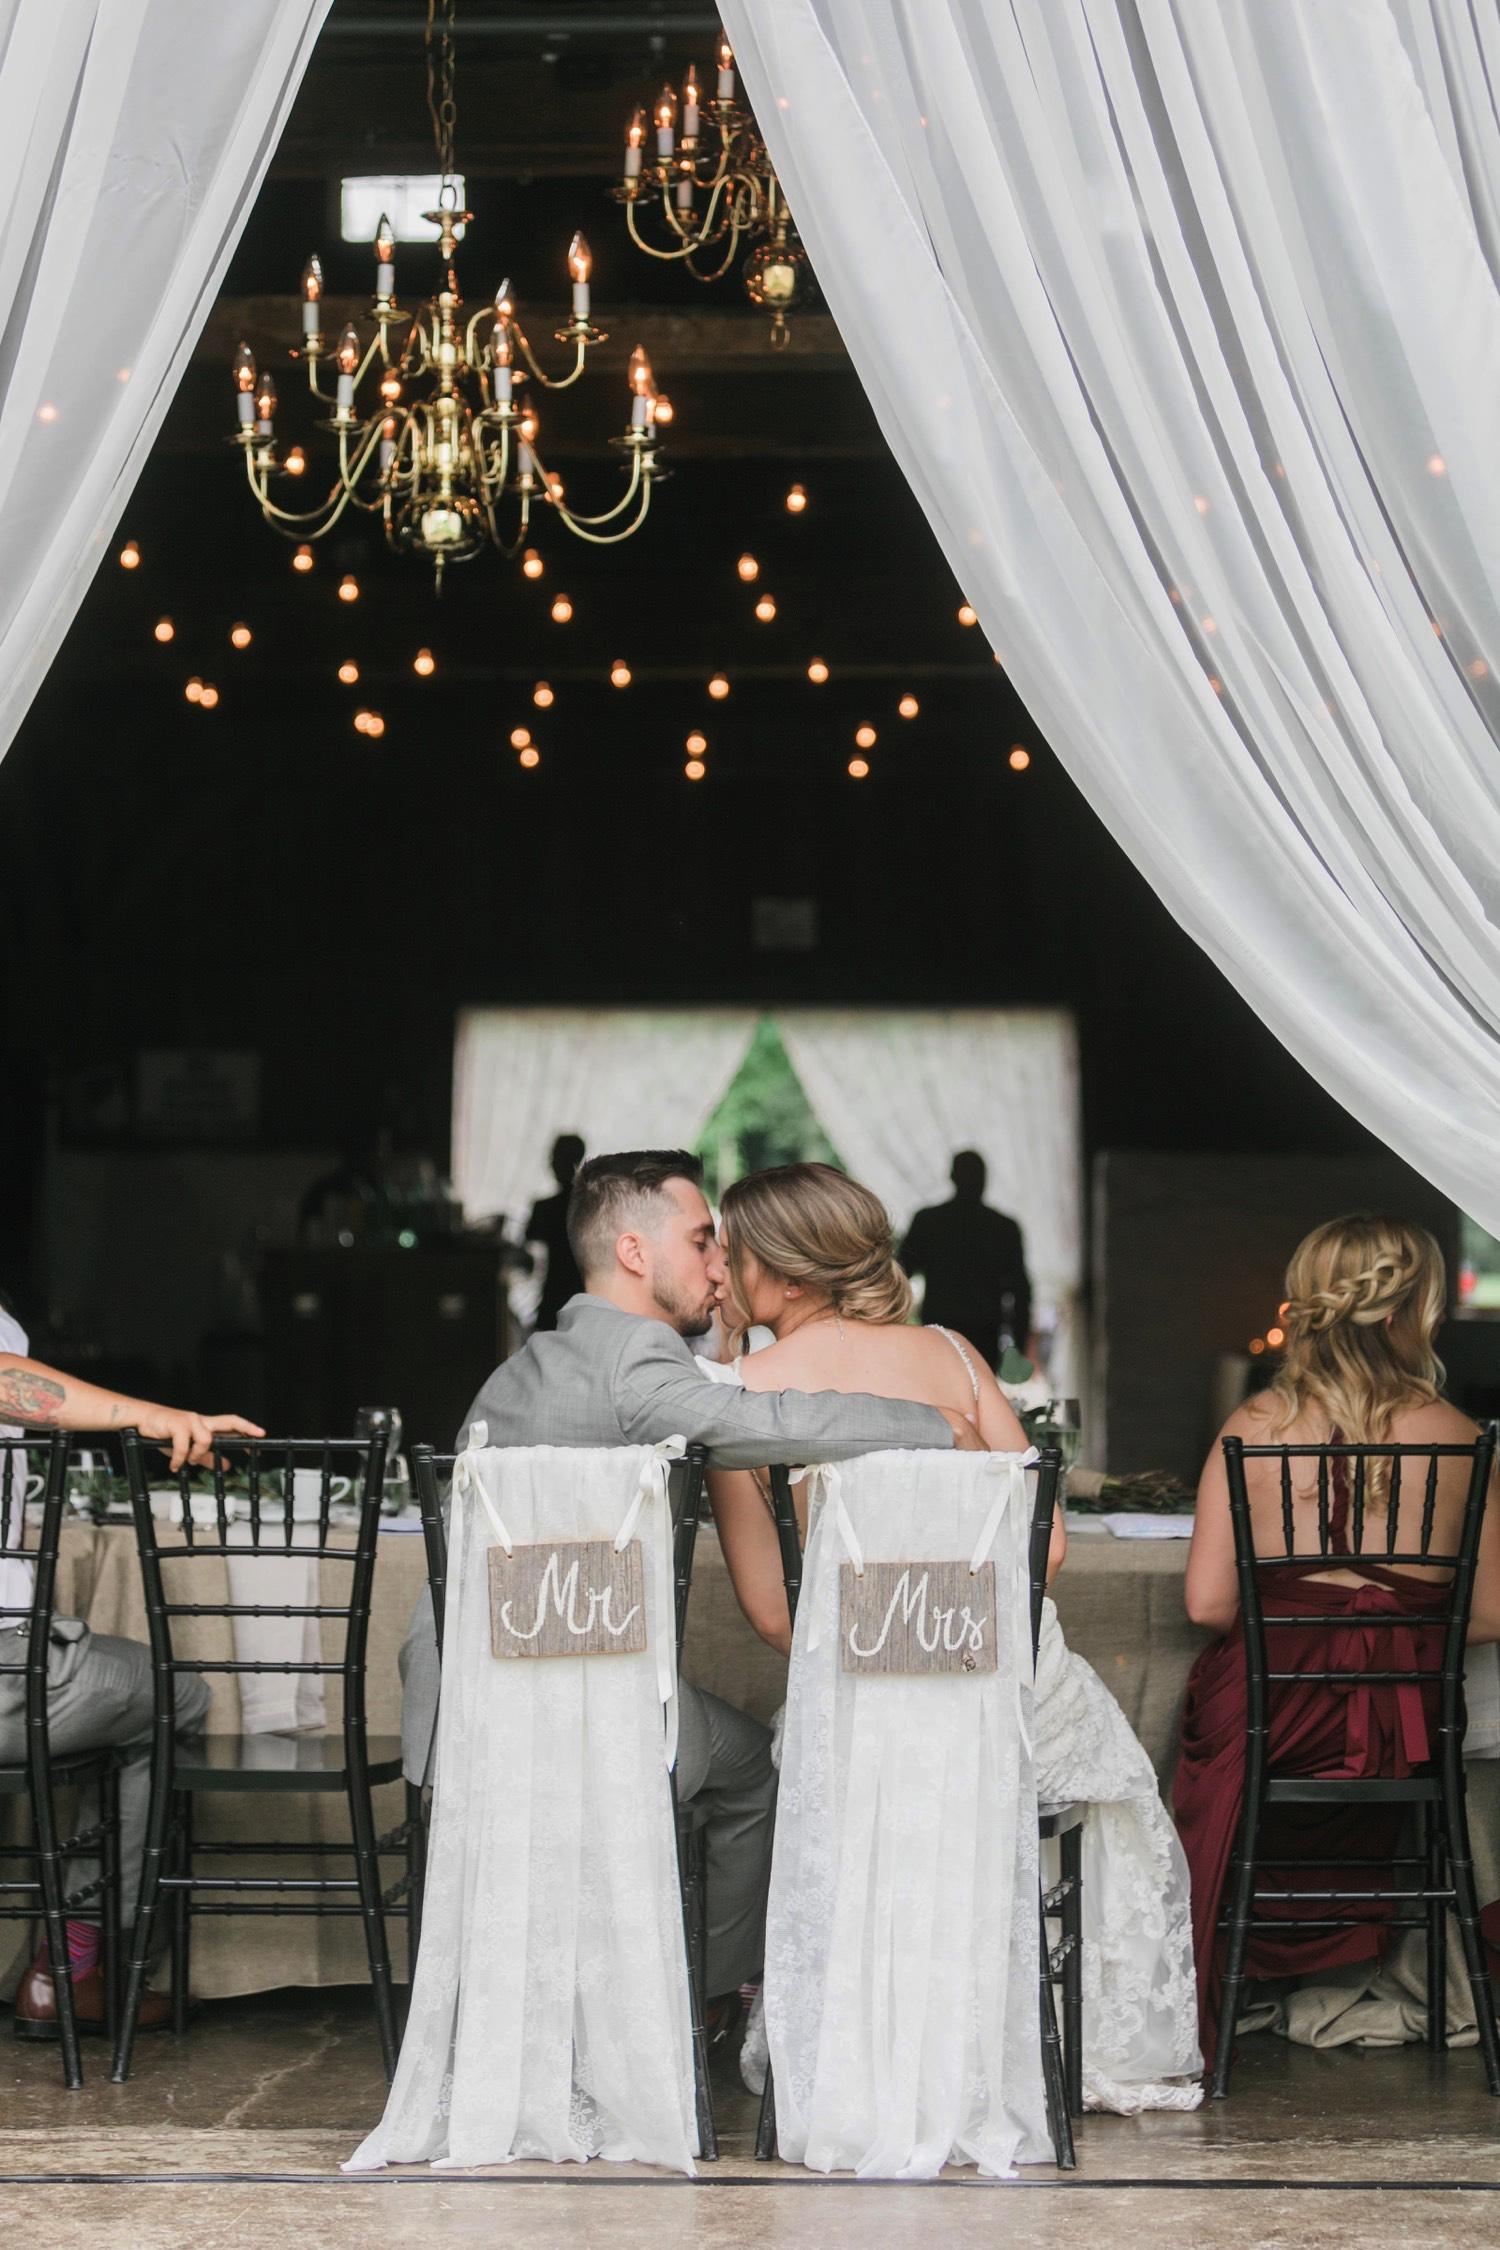 000038_Sam + Jesse - BLOG-00065_Niagara_Wedding_Photography_Daniel_Ricci_Balls_falls_Wedding.jpg